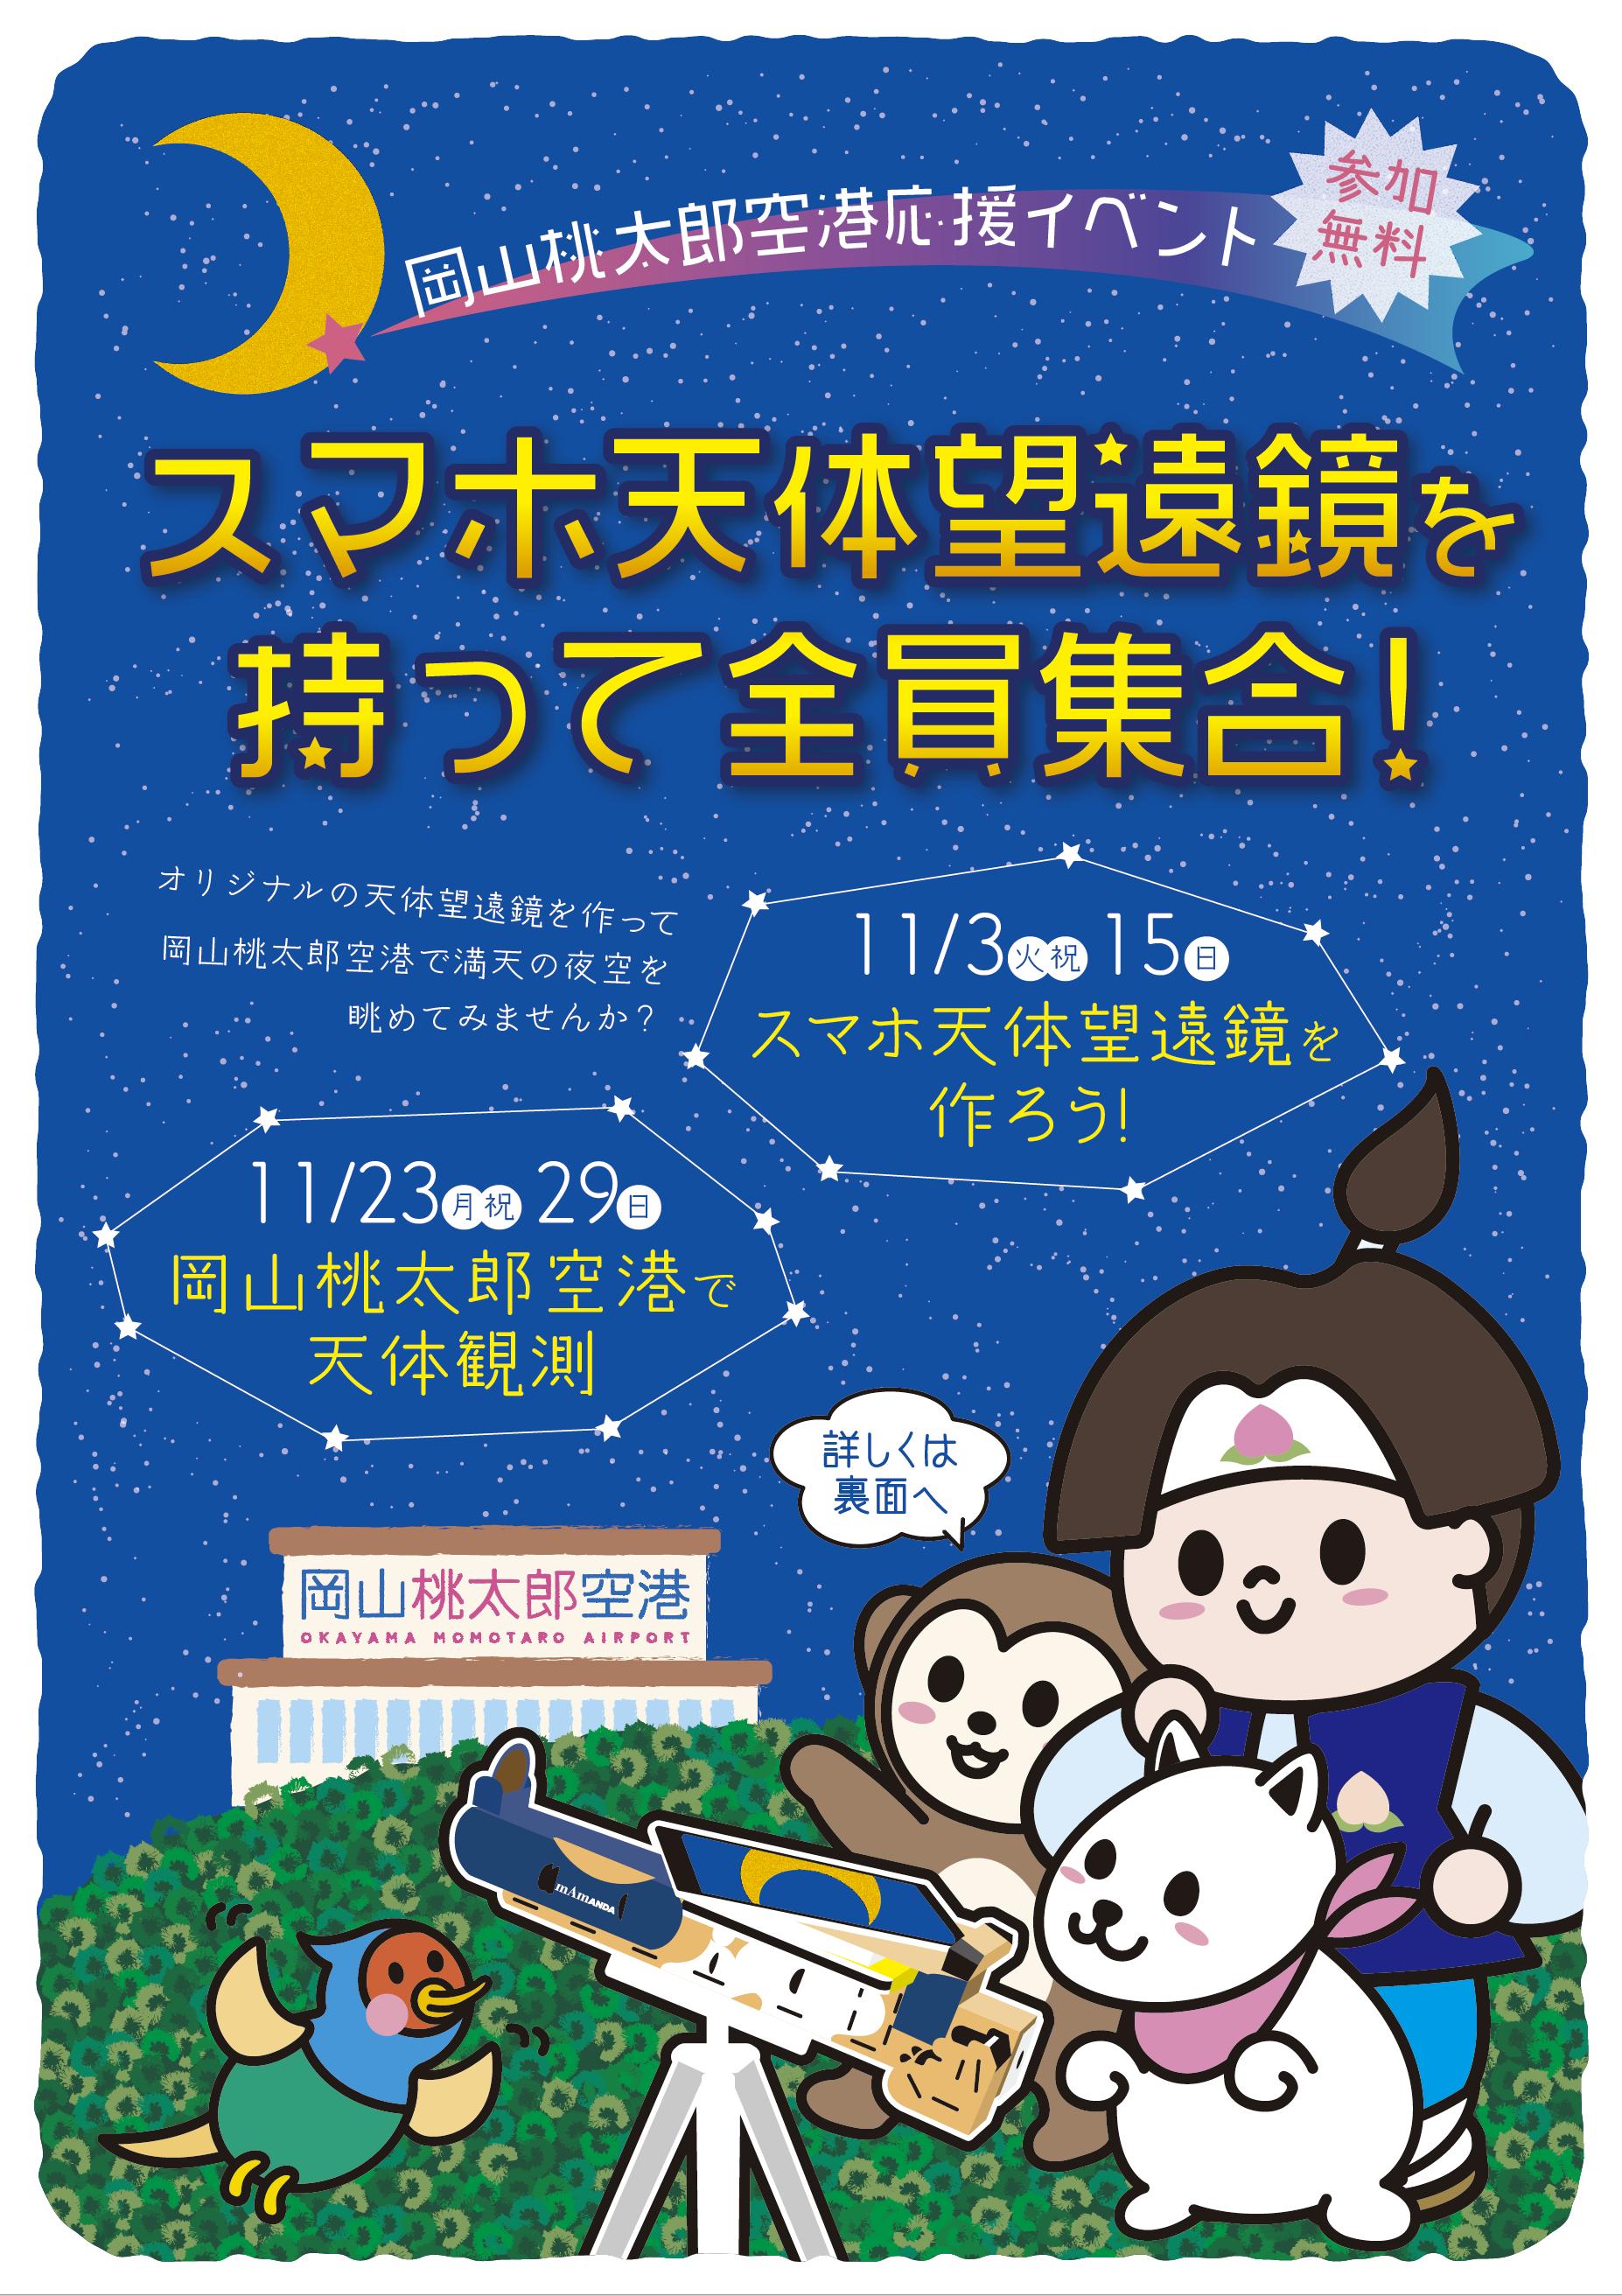 岡山桃太郎空港応援イベント